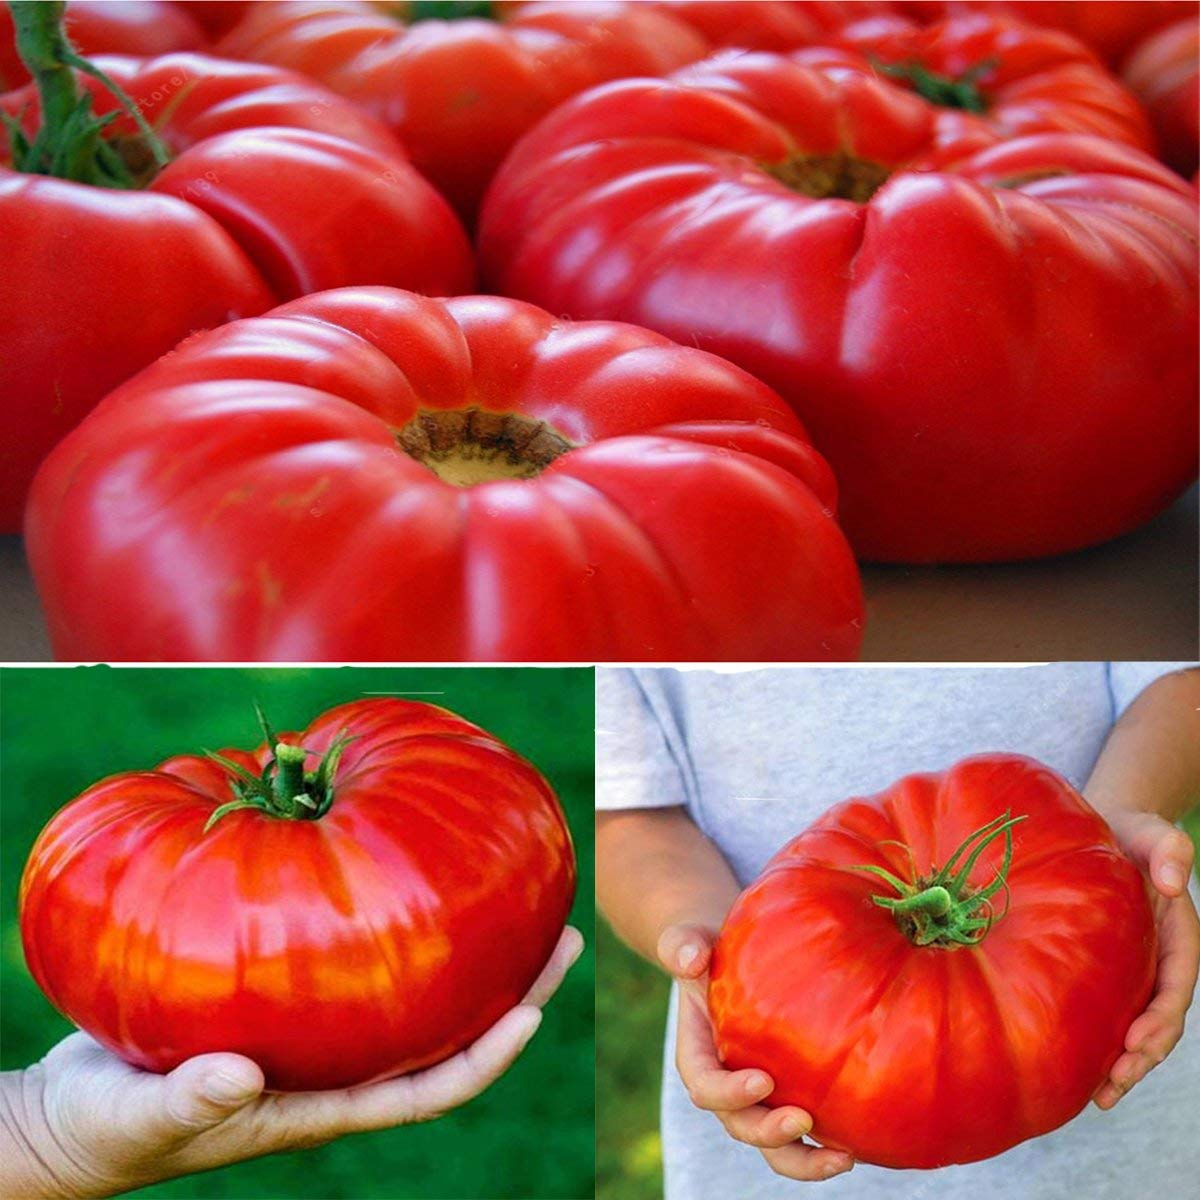 100 pcs/bag Hybrid Giant Tomato Seeds Super Big Beefsteak Tomato Vegetable Garden Plants Seed